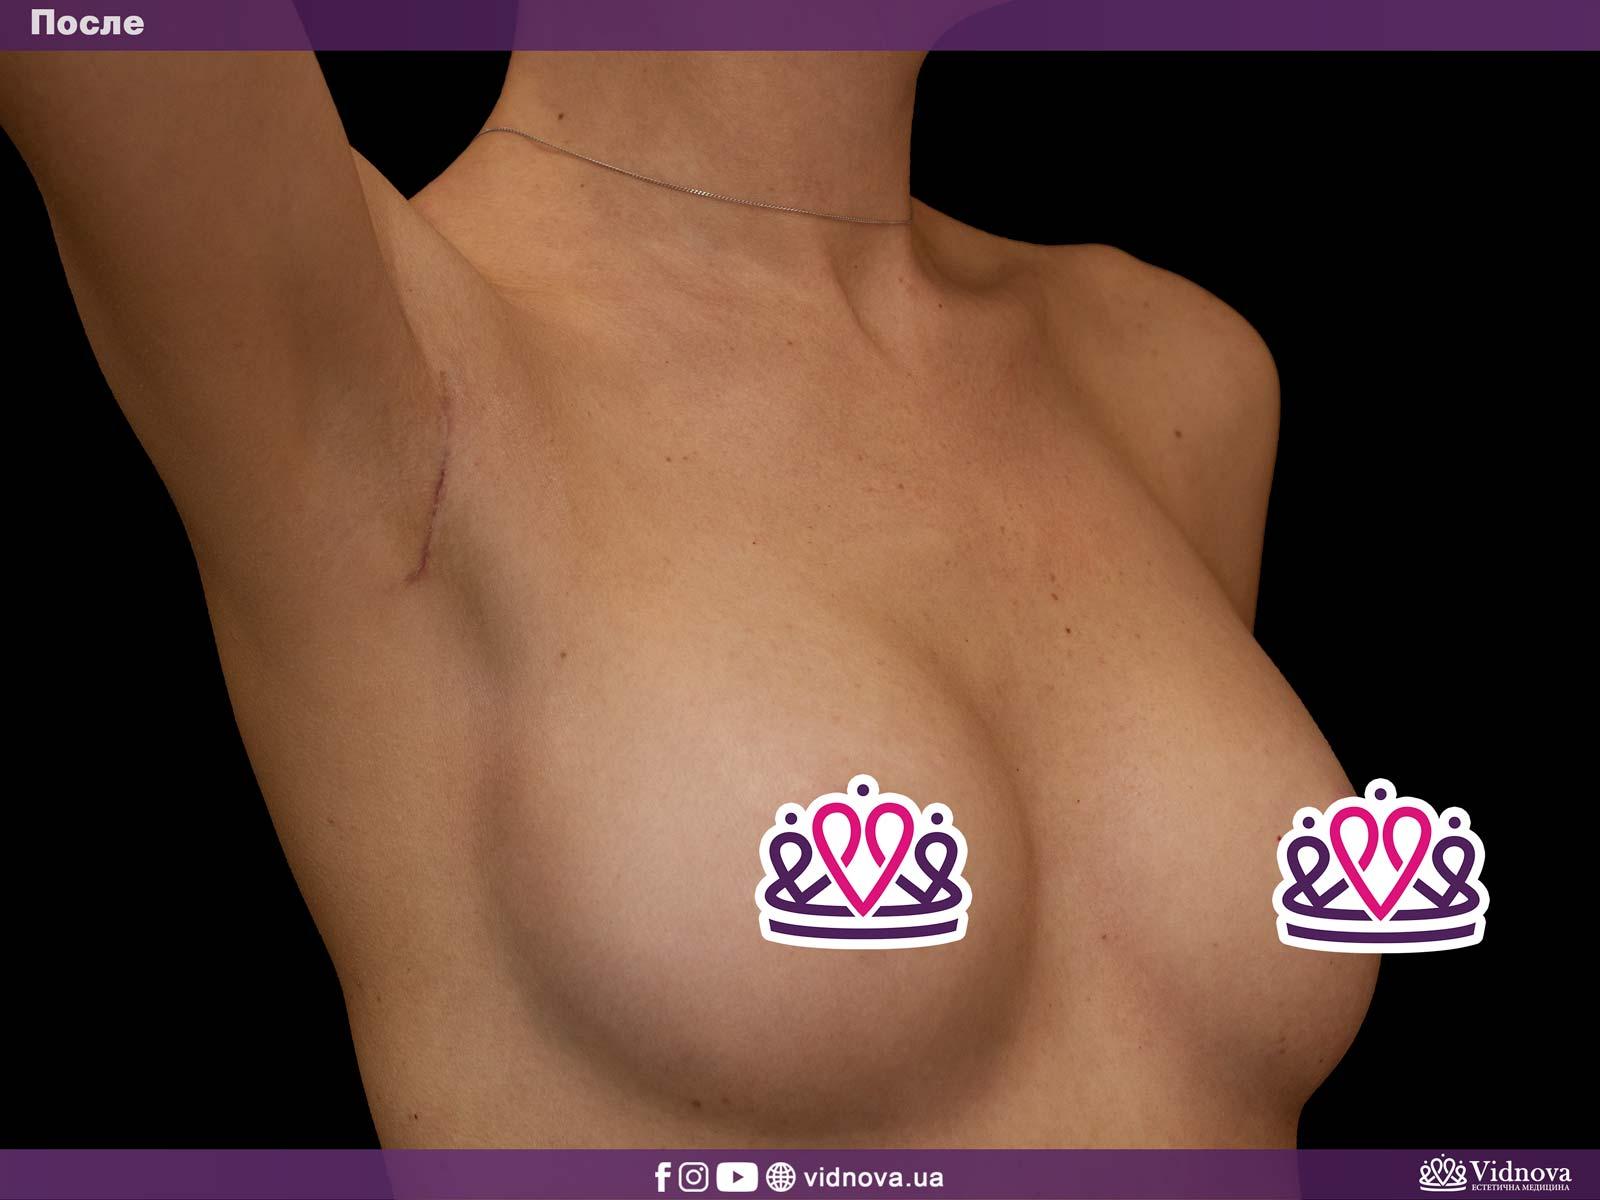 Увеличение груди: Фото ДО и ПОСЛЕ - Пример №9-4 - Клиника Vidnova